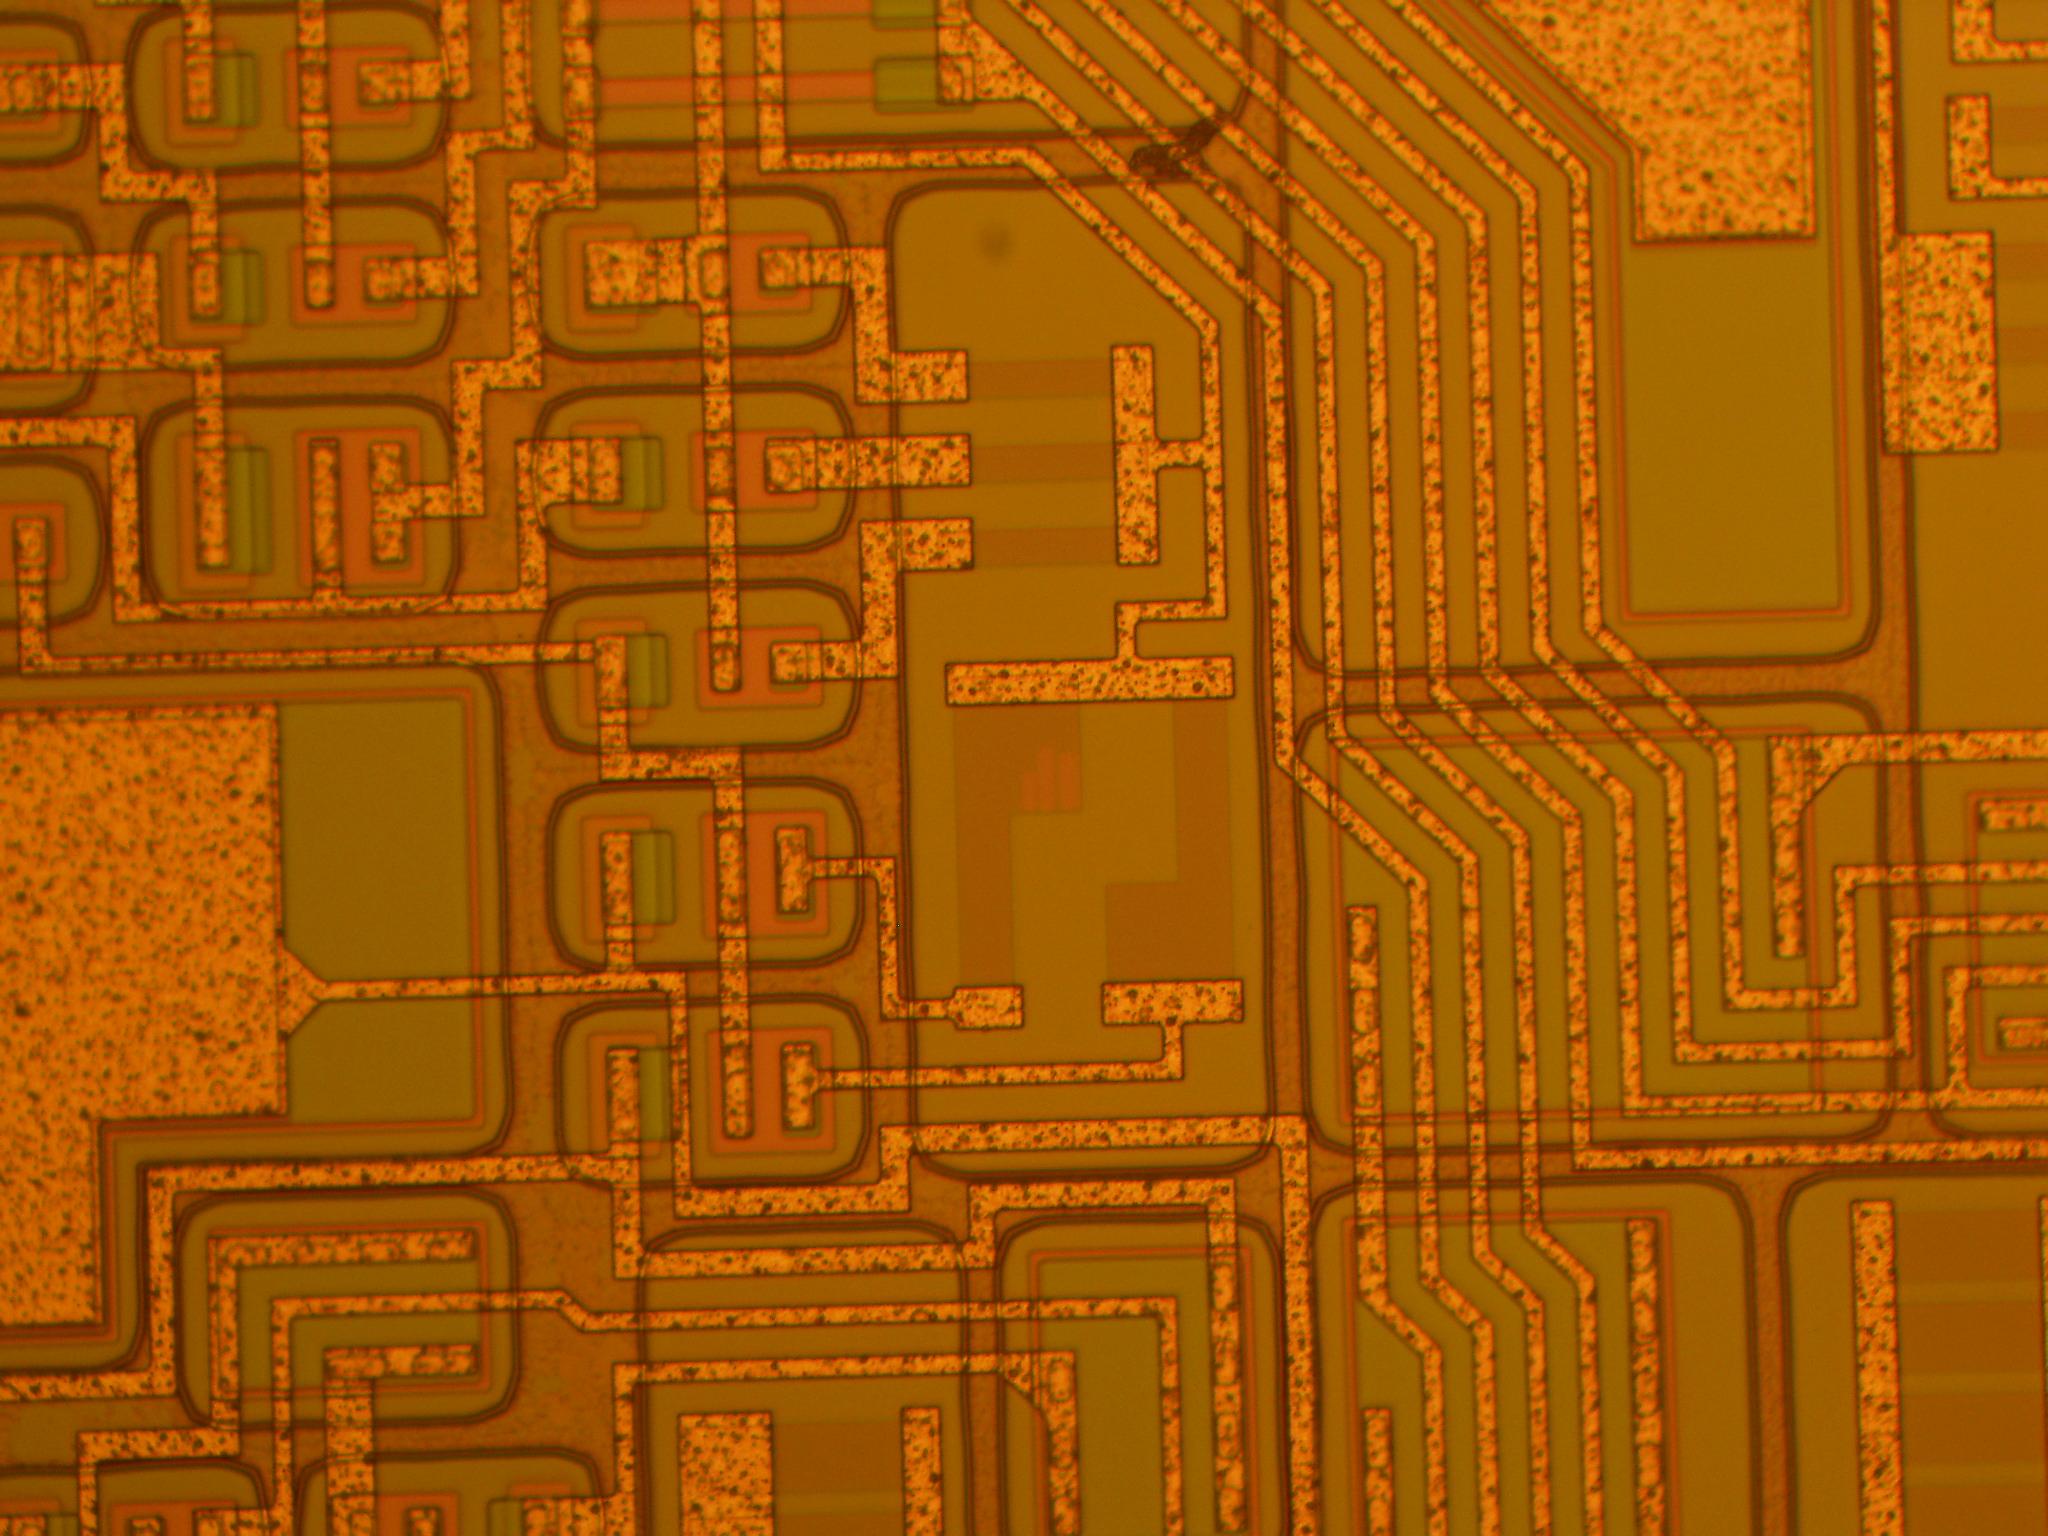 Trim SiCr on Silicon